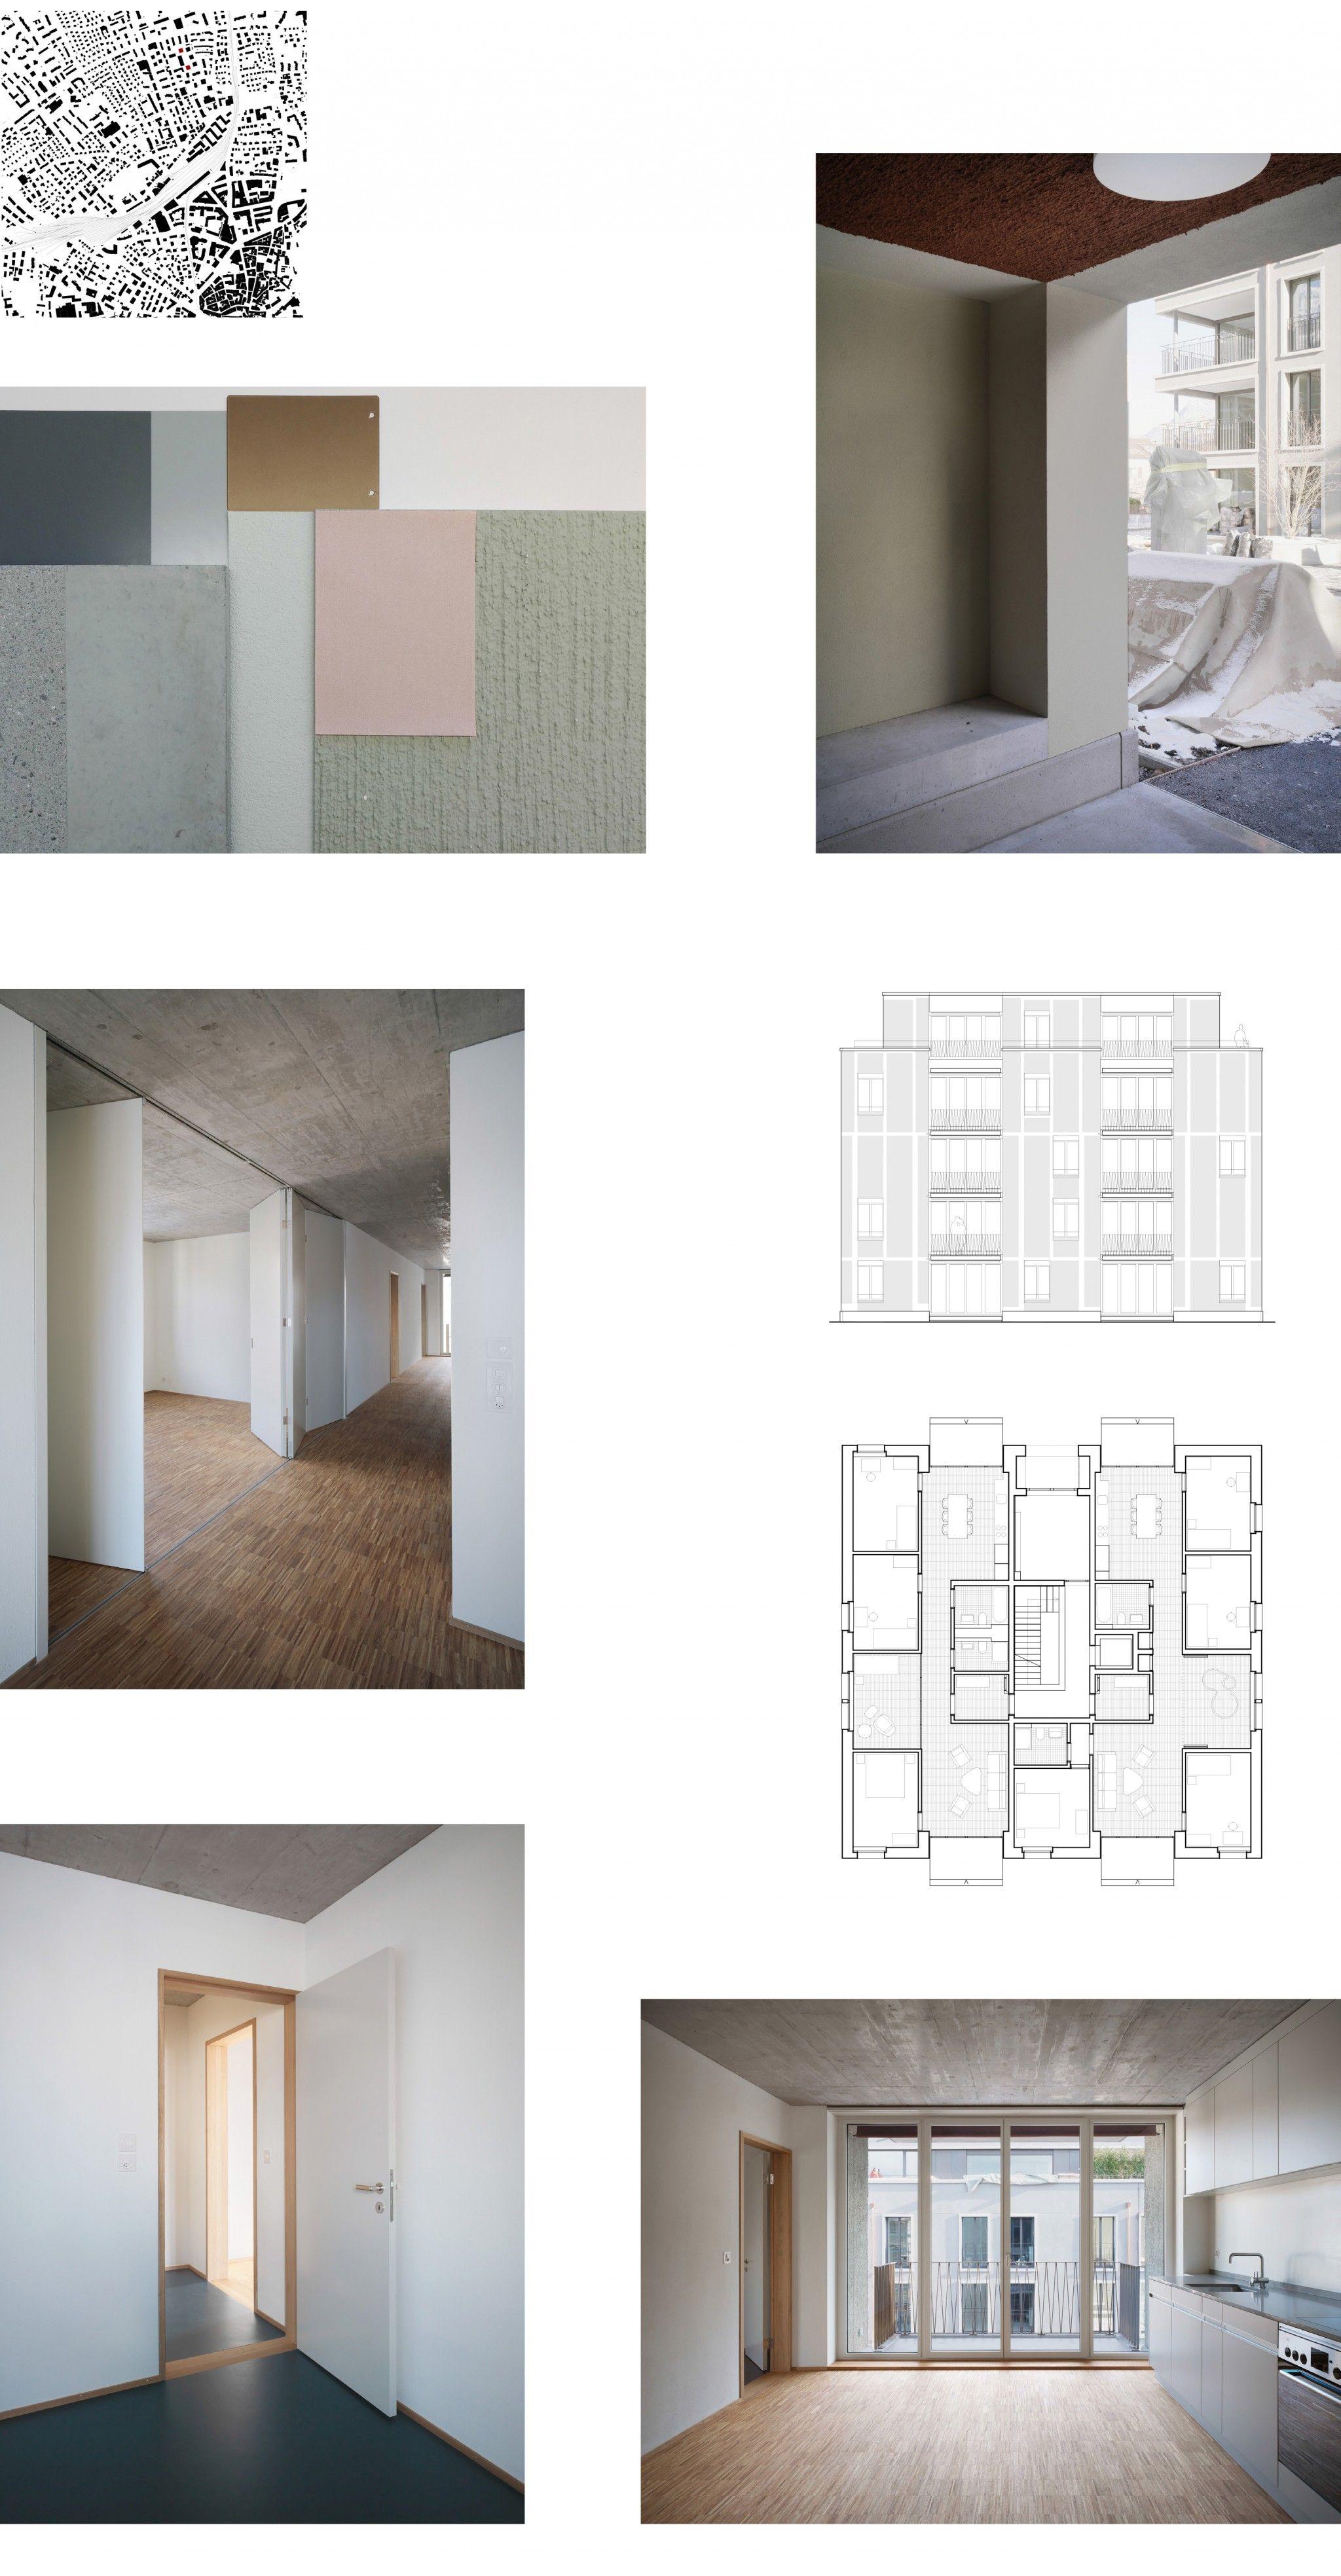 Mehrfamilienh user calandastrasse chur corinna menn floorplan architecture residential - Farbkonzept haus ...